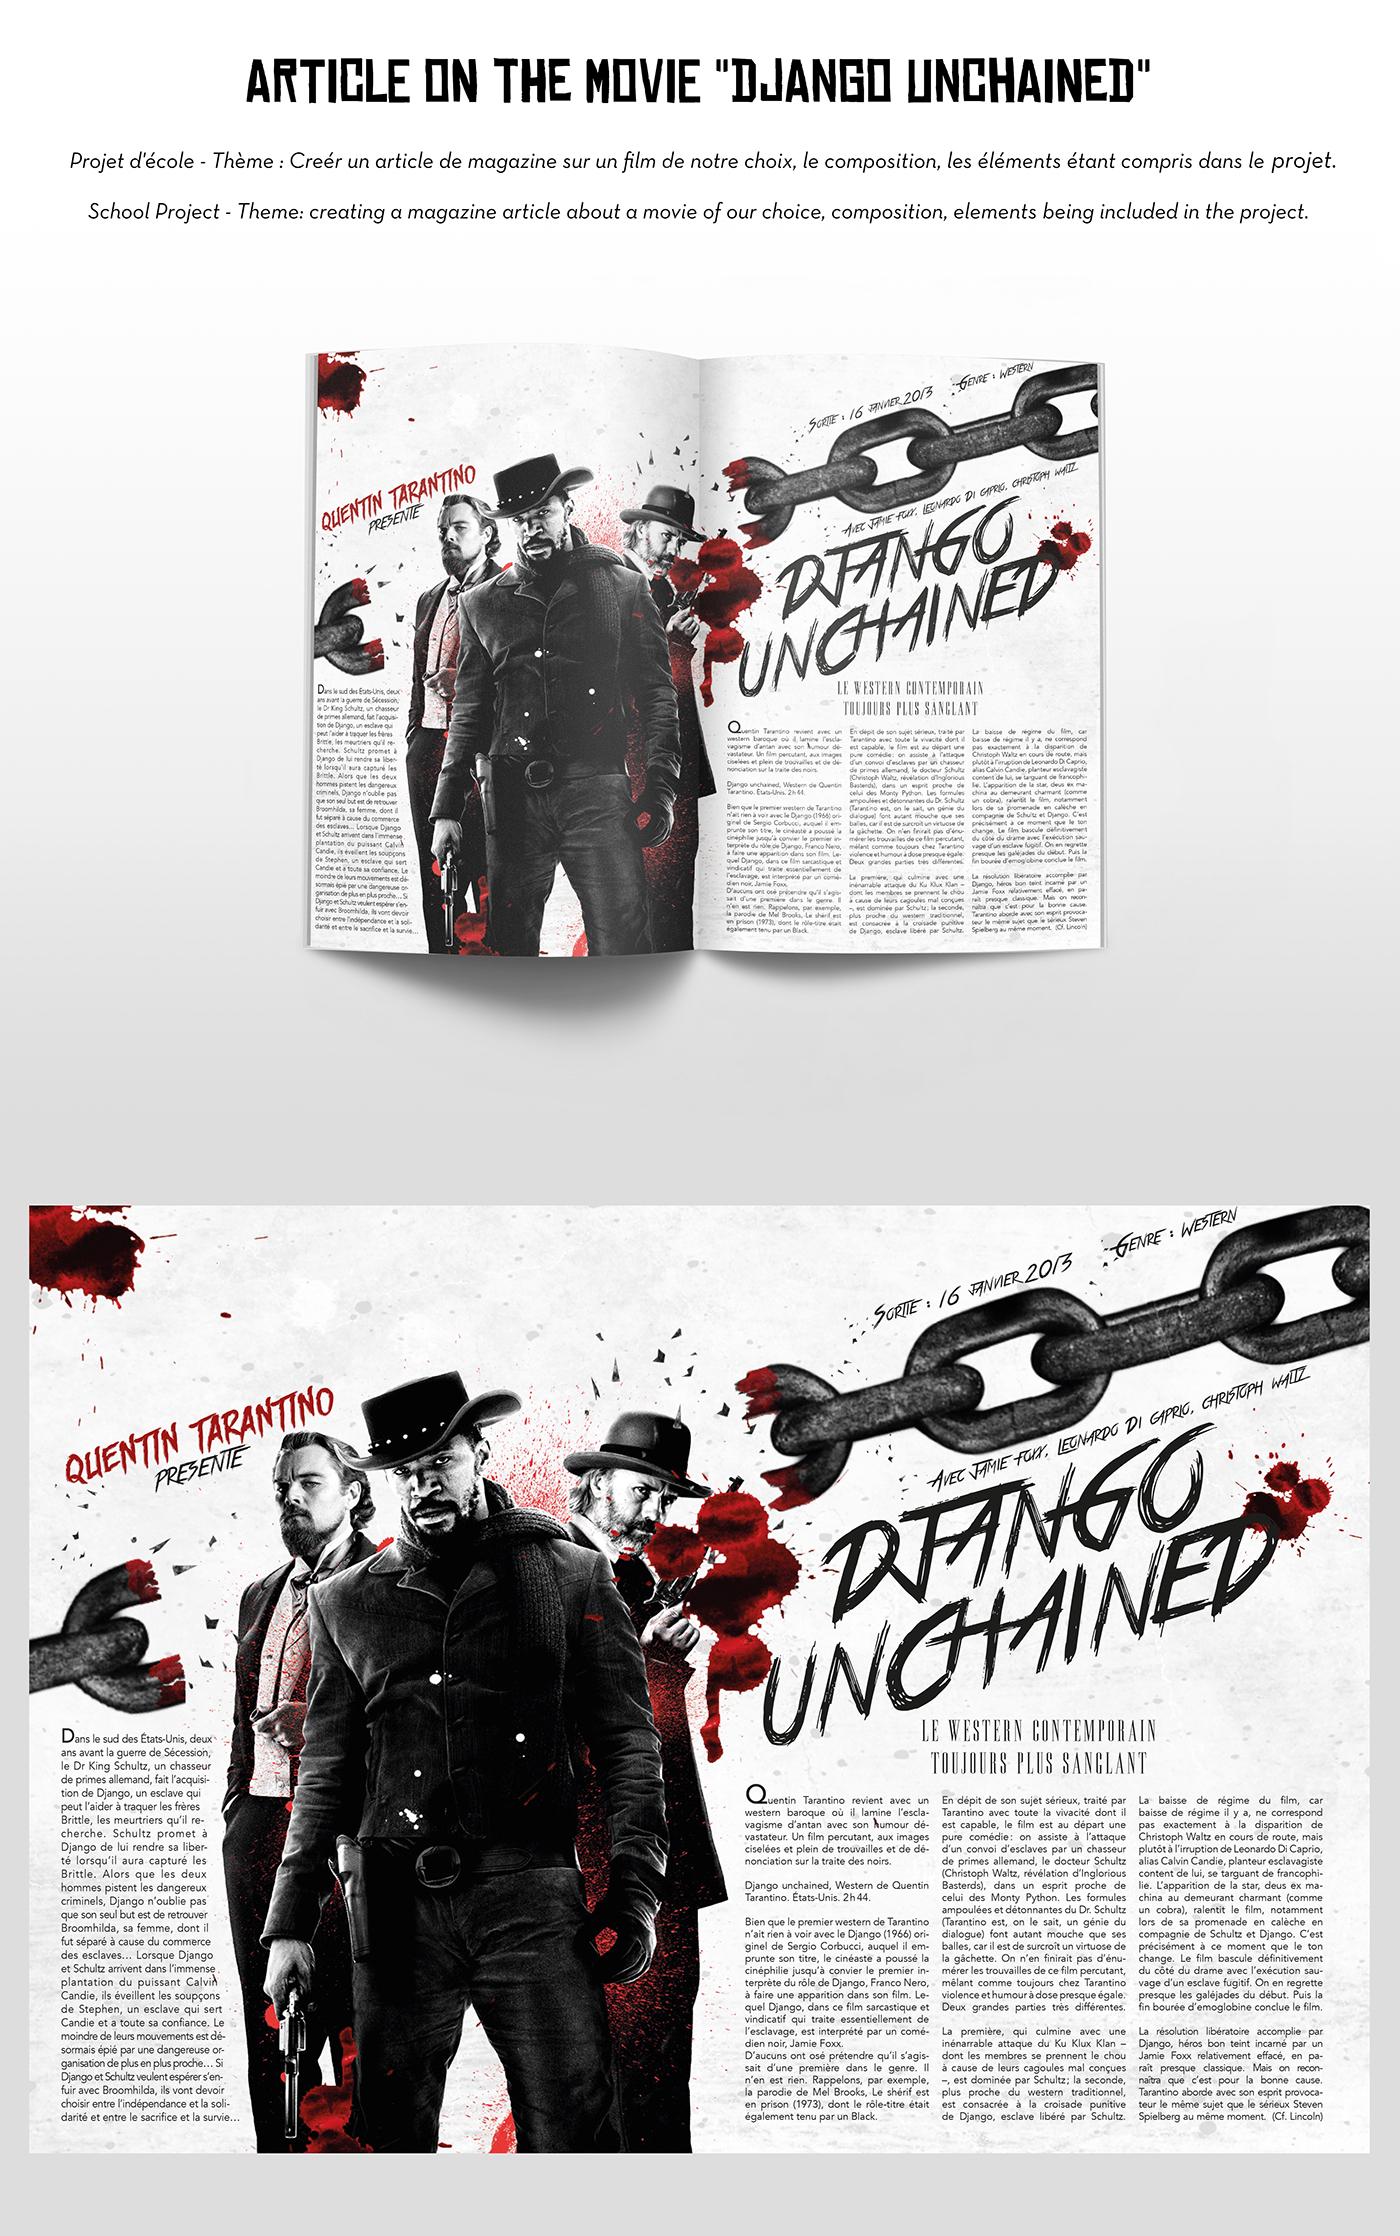 Editing for Django Unchained on Behance